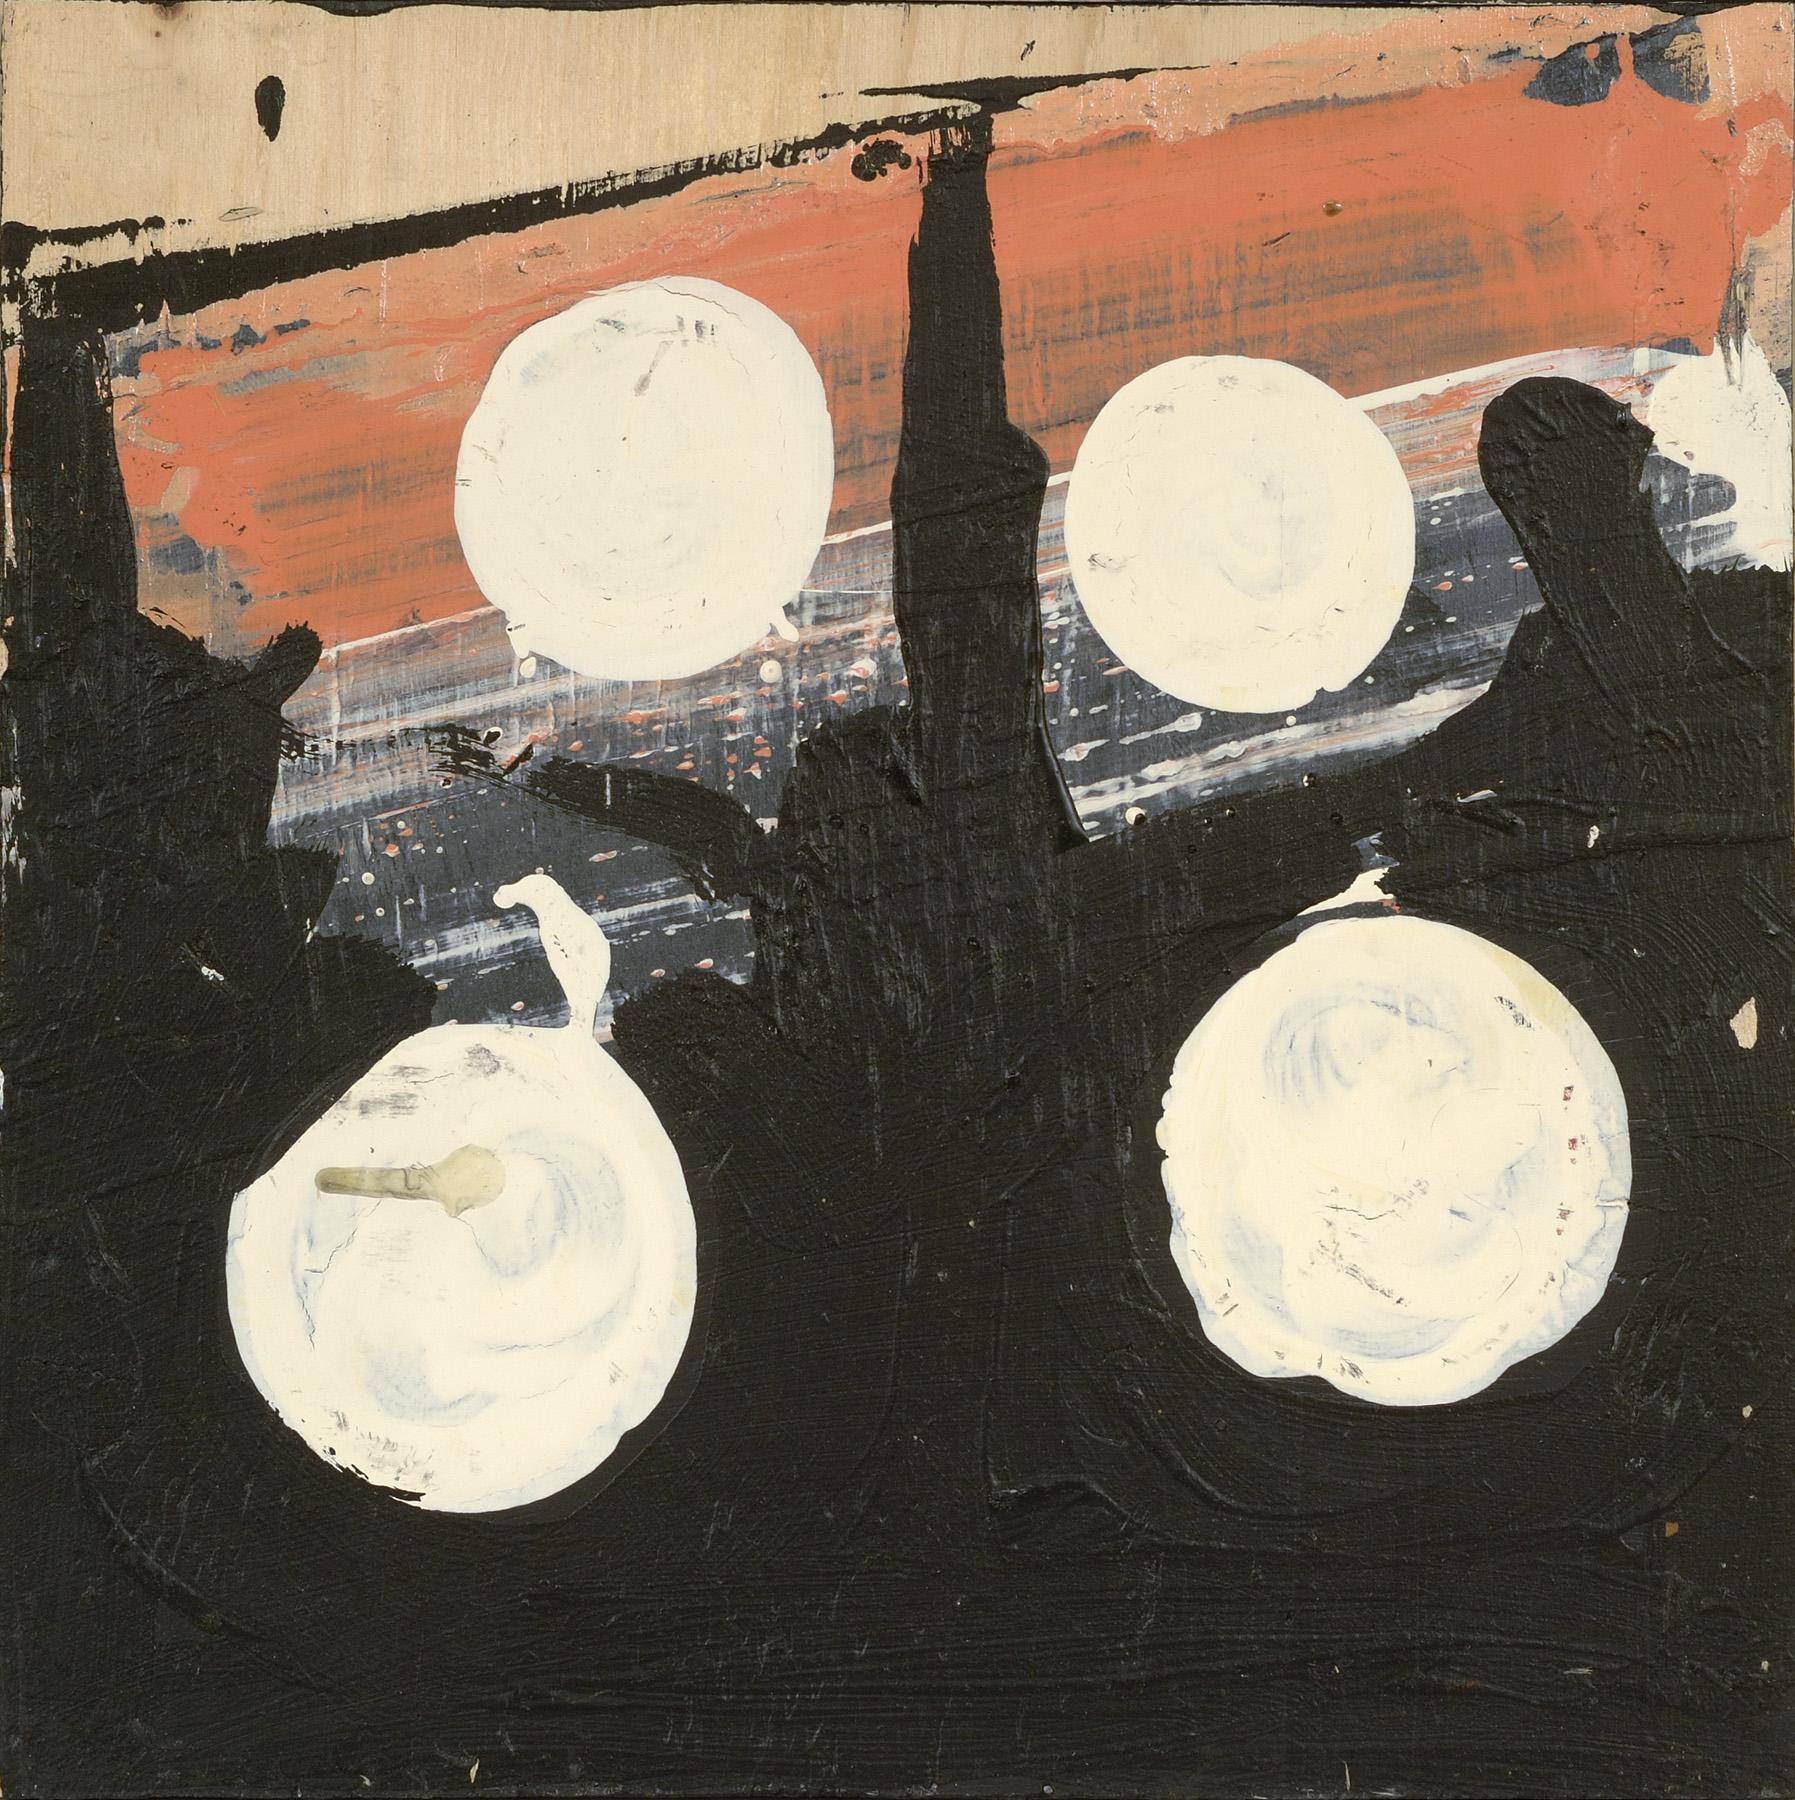 Lemoyne_Série hommage à Matisse #377